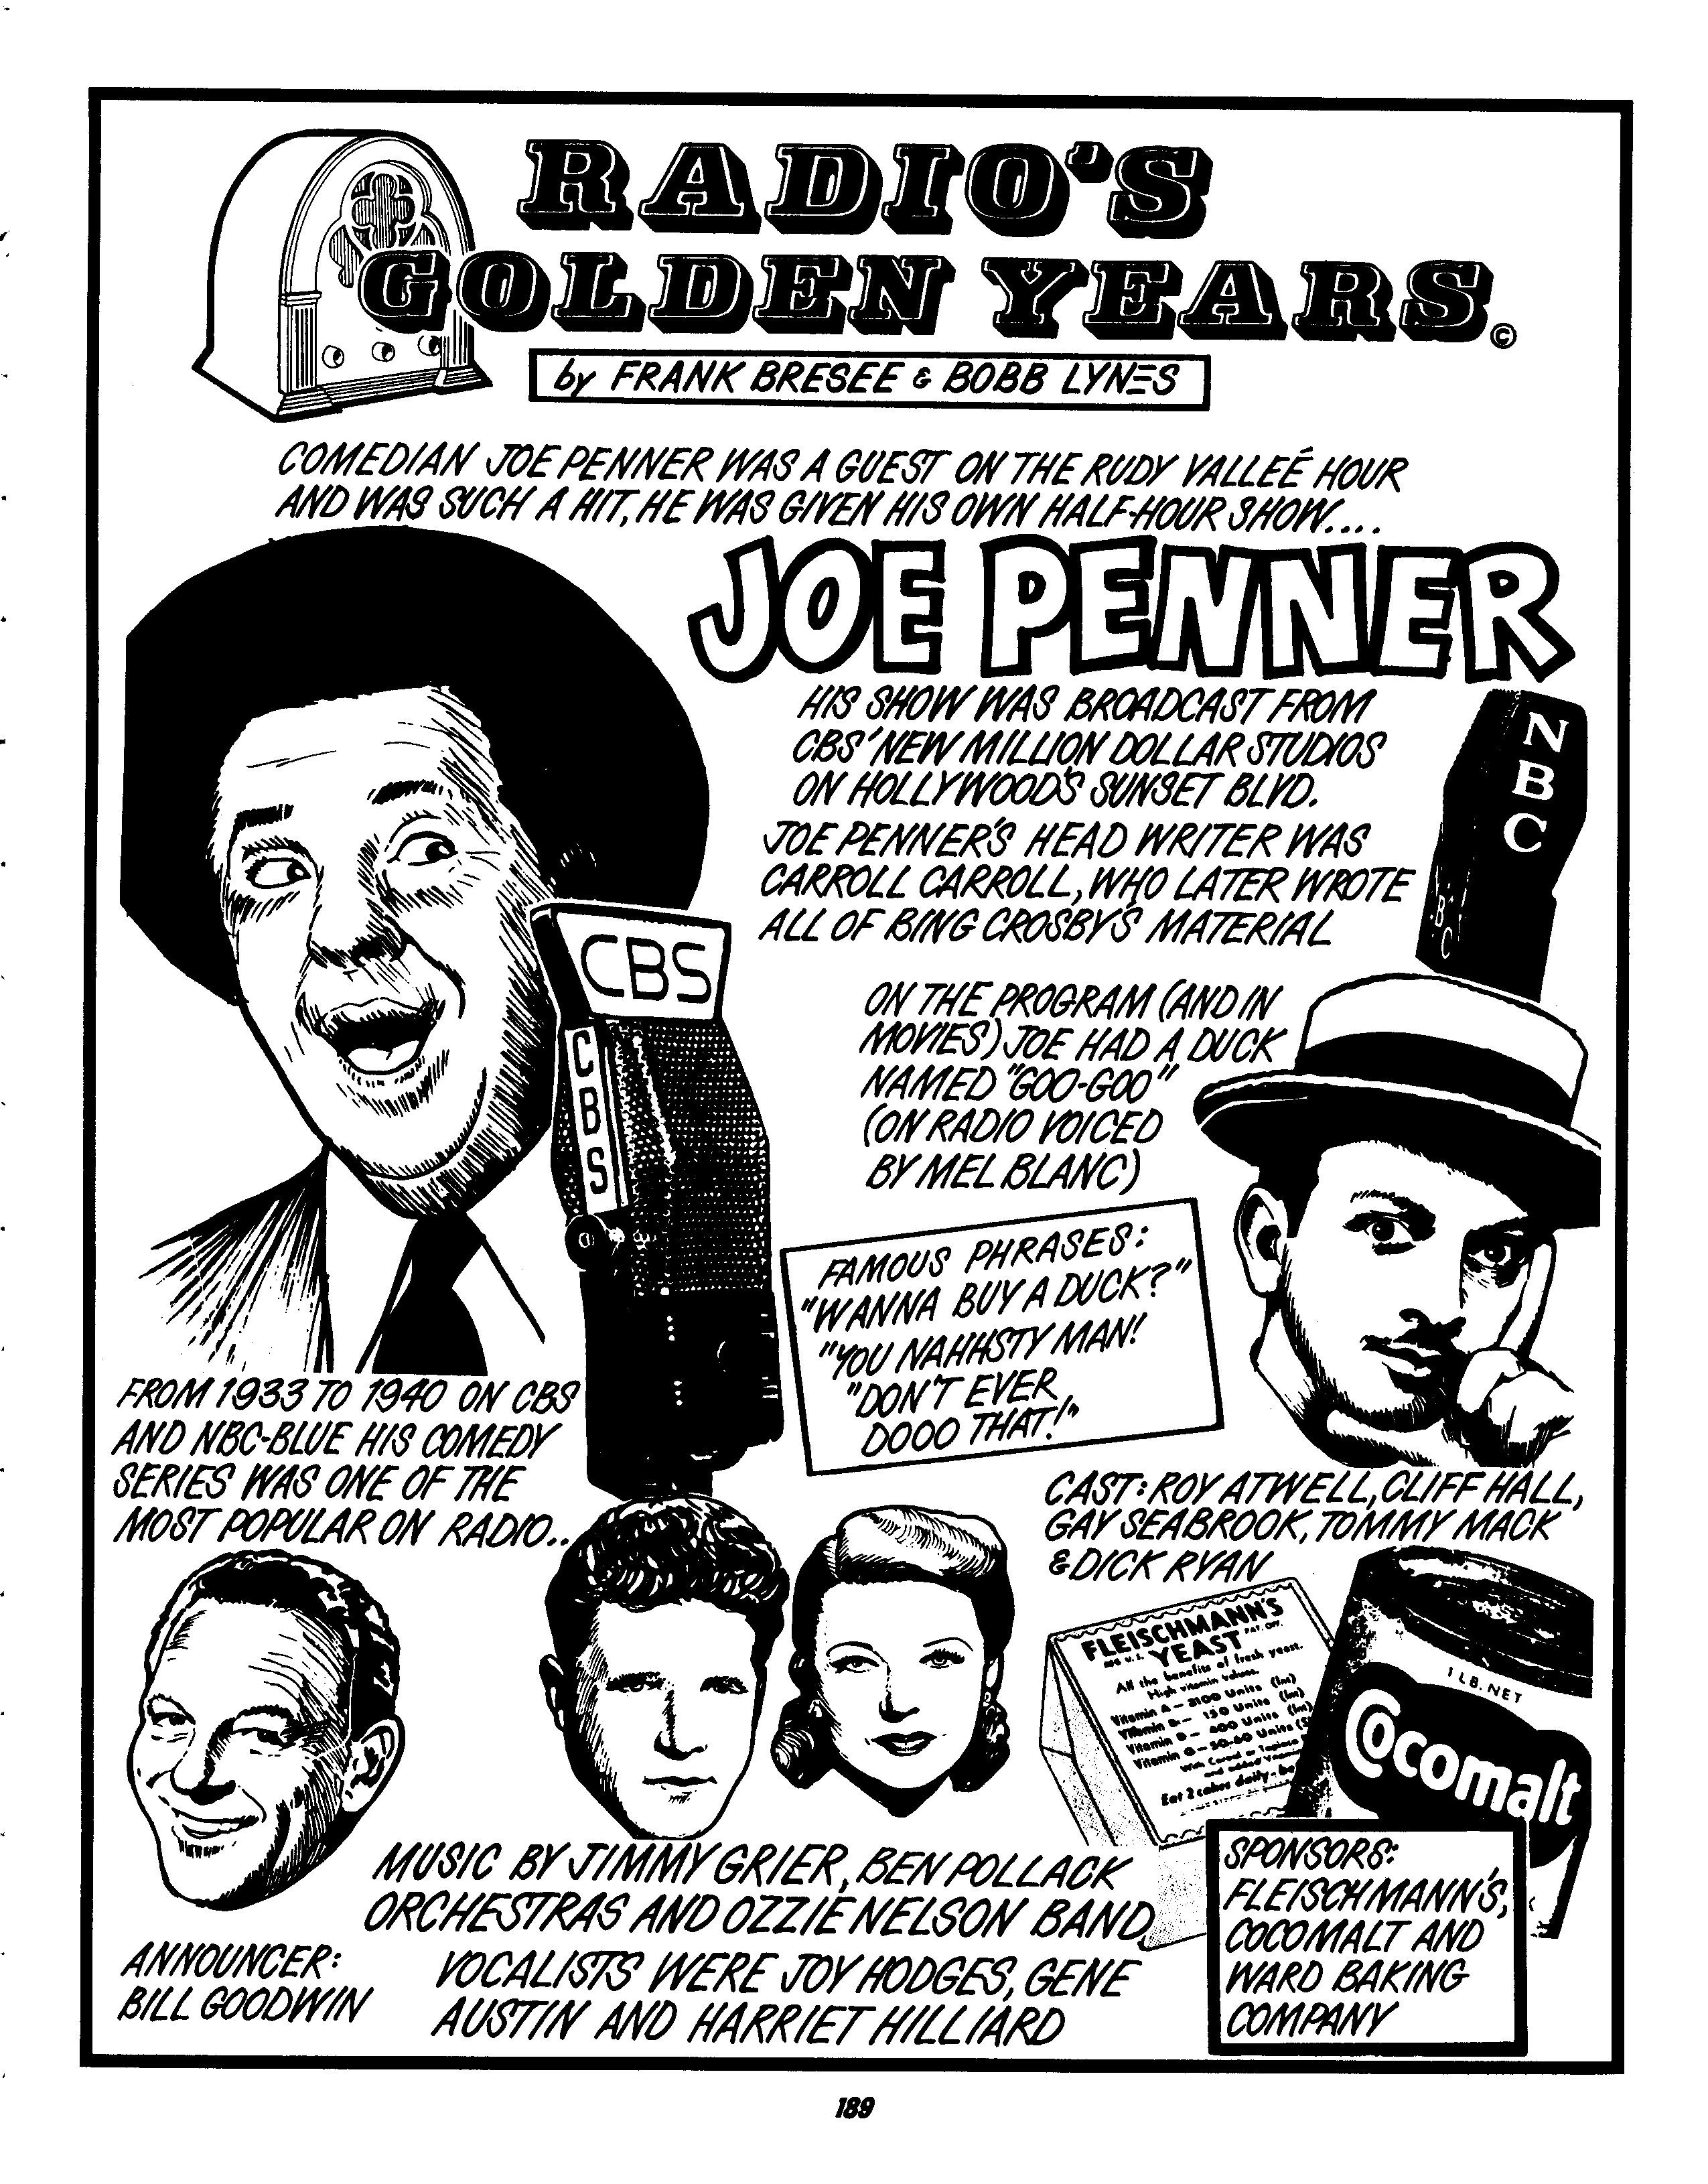 Joe Penner